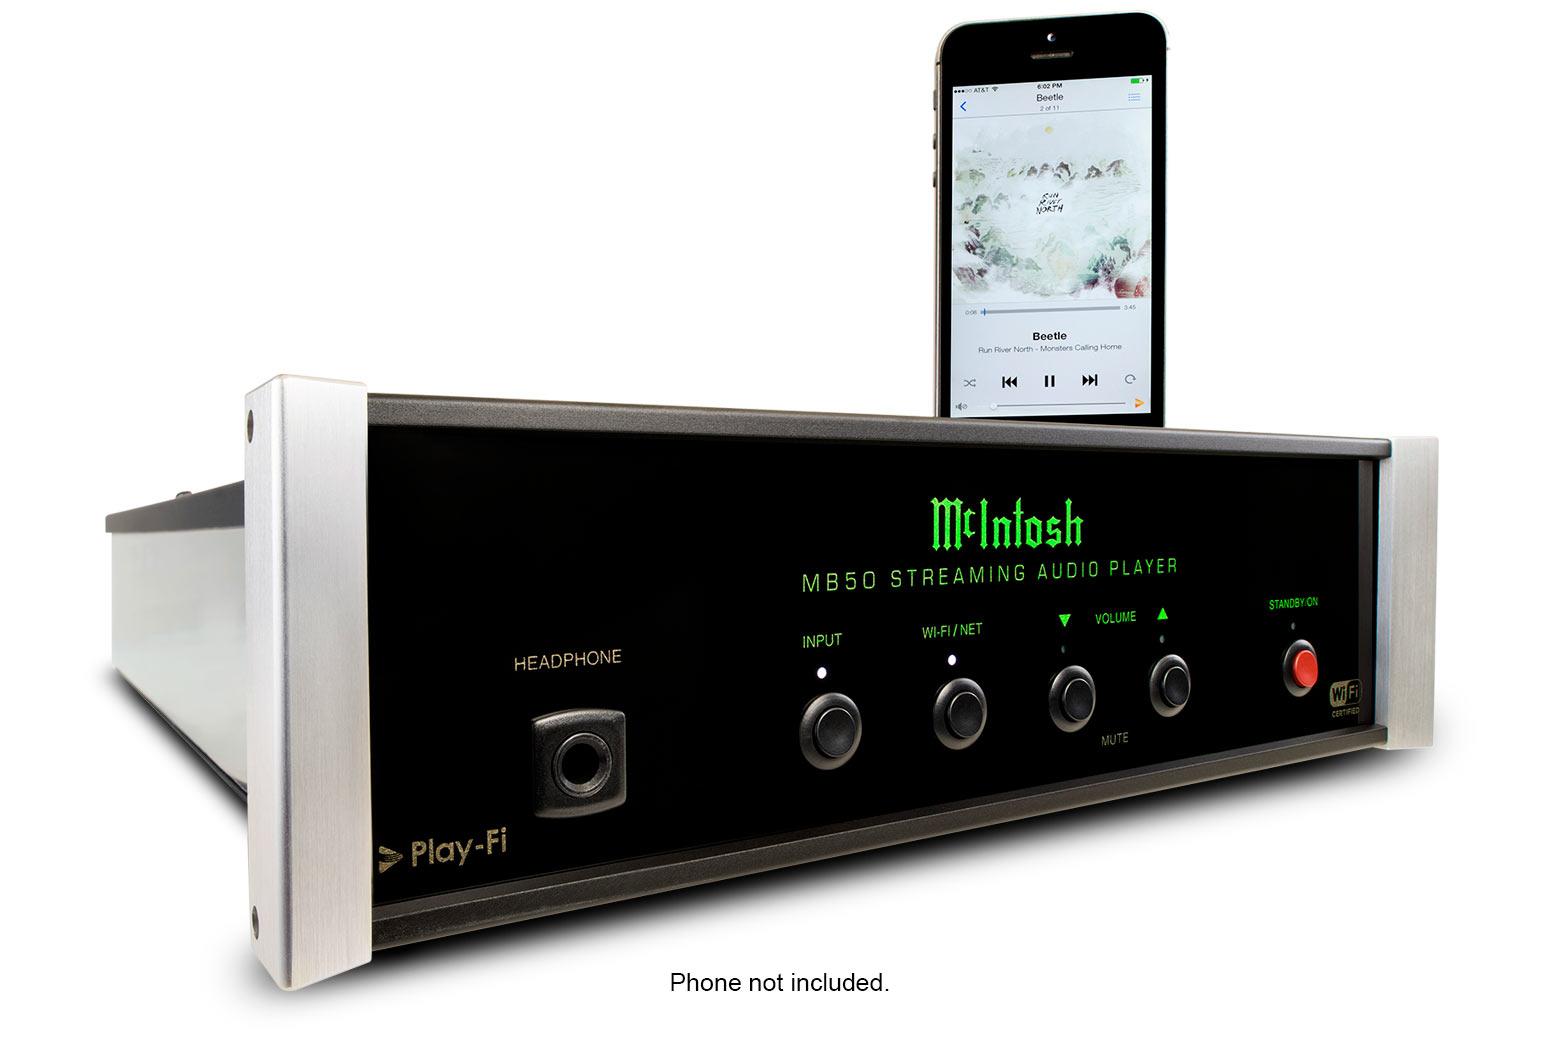 McIntosh MB50 Streaming Audio Player